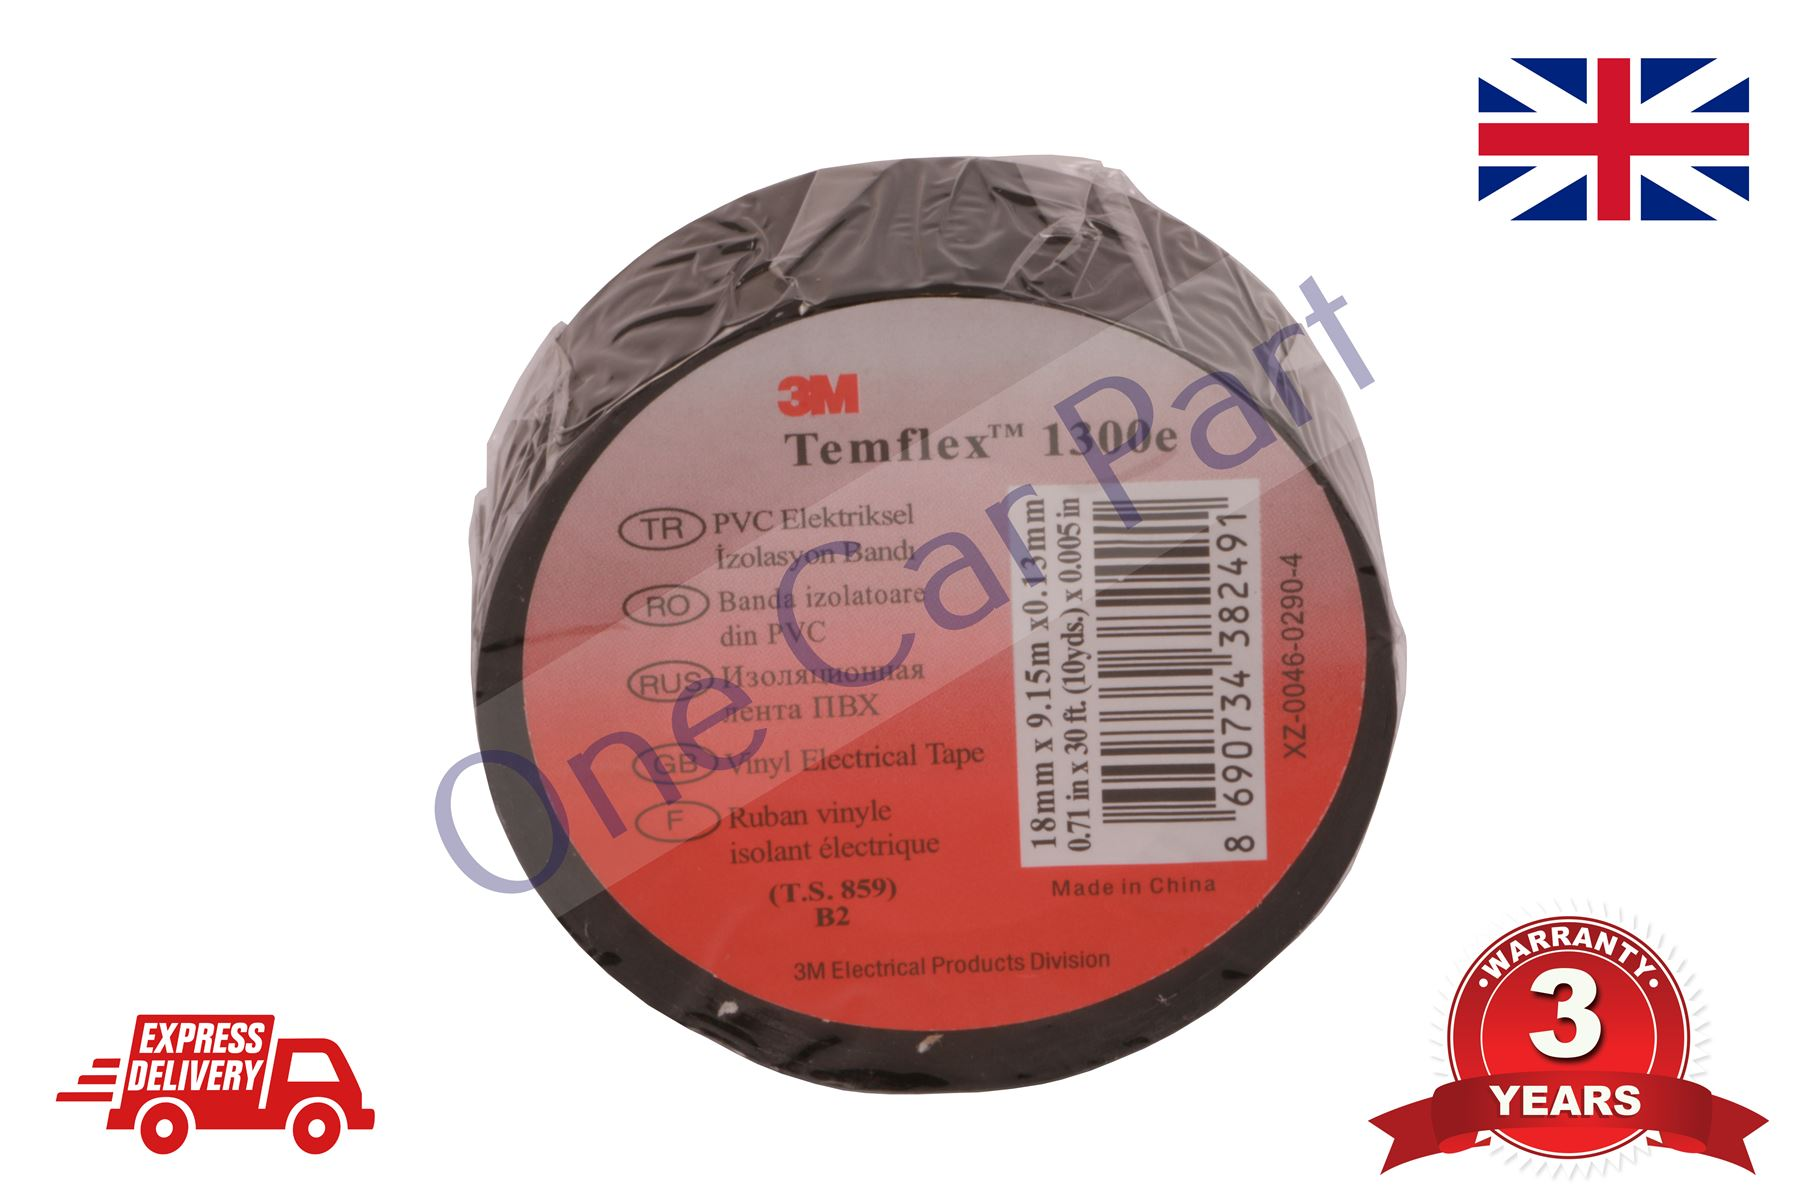 3M 1x Temflex Insulation//Isolation//Electrical Tape 15mm x 10m Black